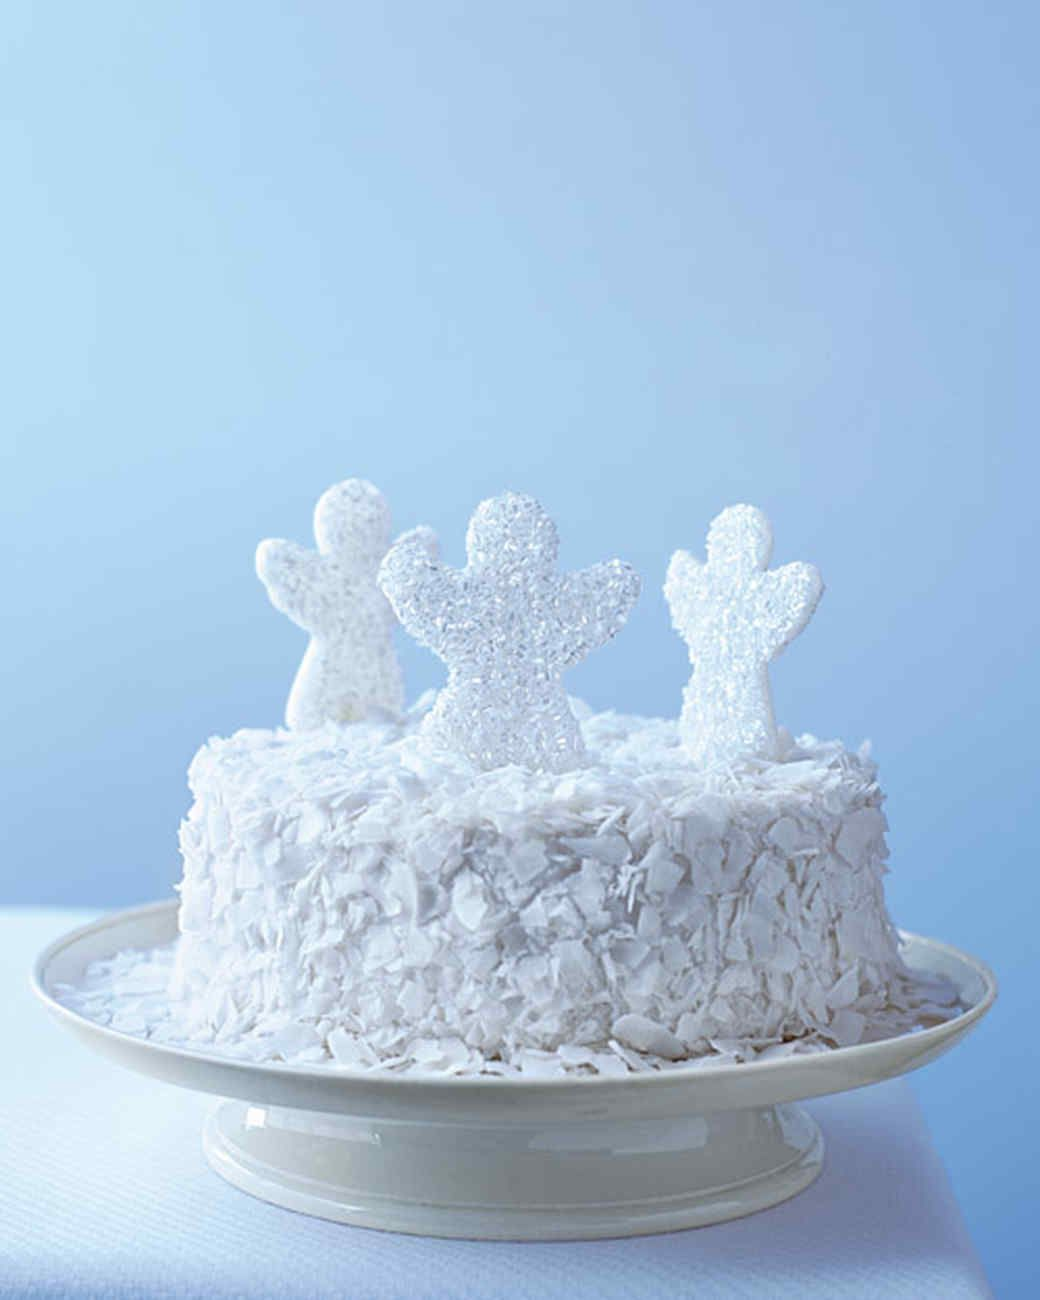 Coconut Angel Food Cake Recipe Recipe Angel Food Cake Christmas Cake Recipes Angel Food